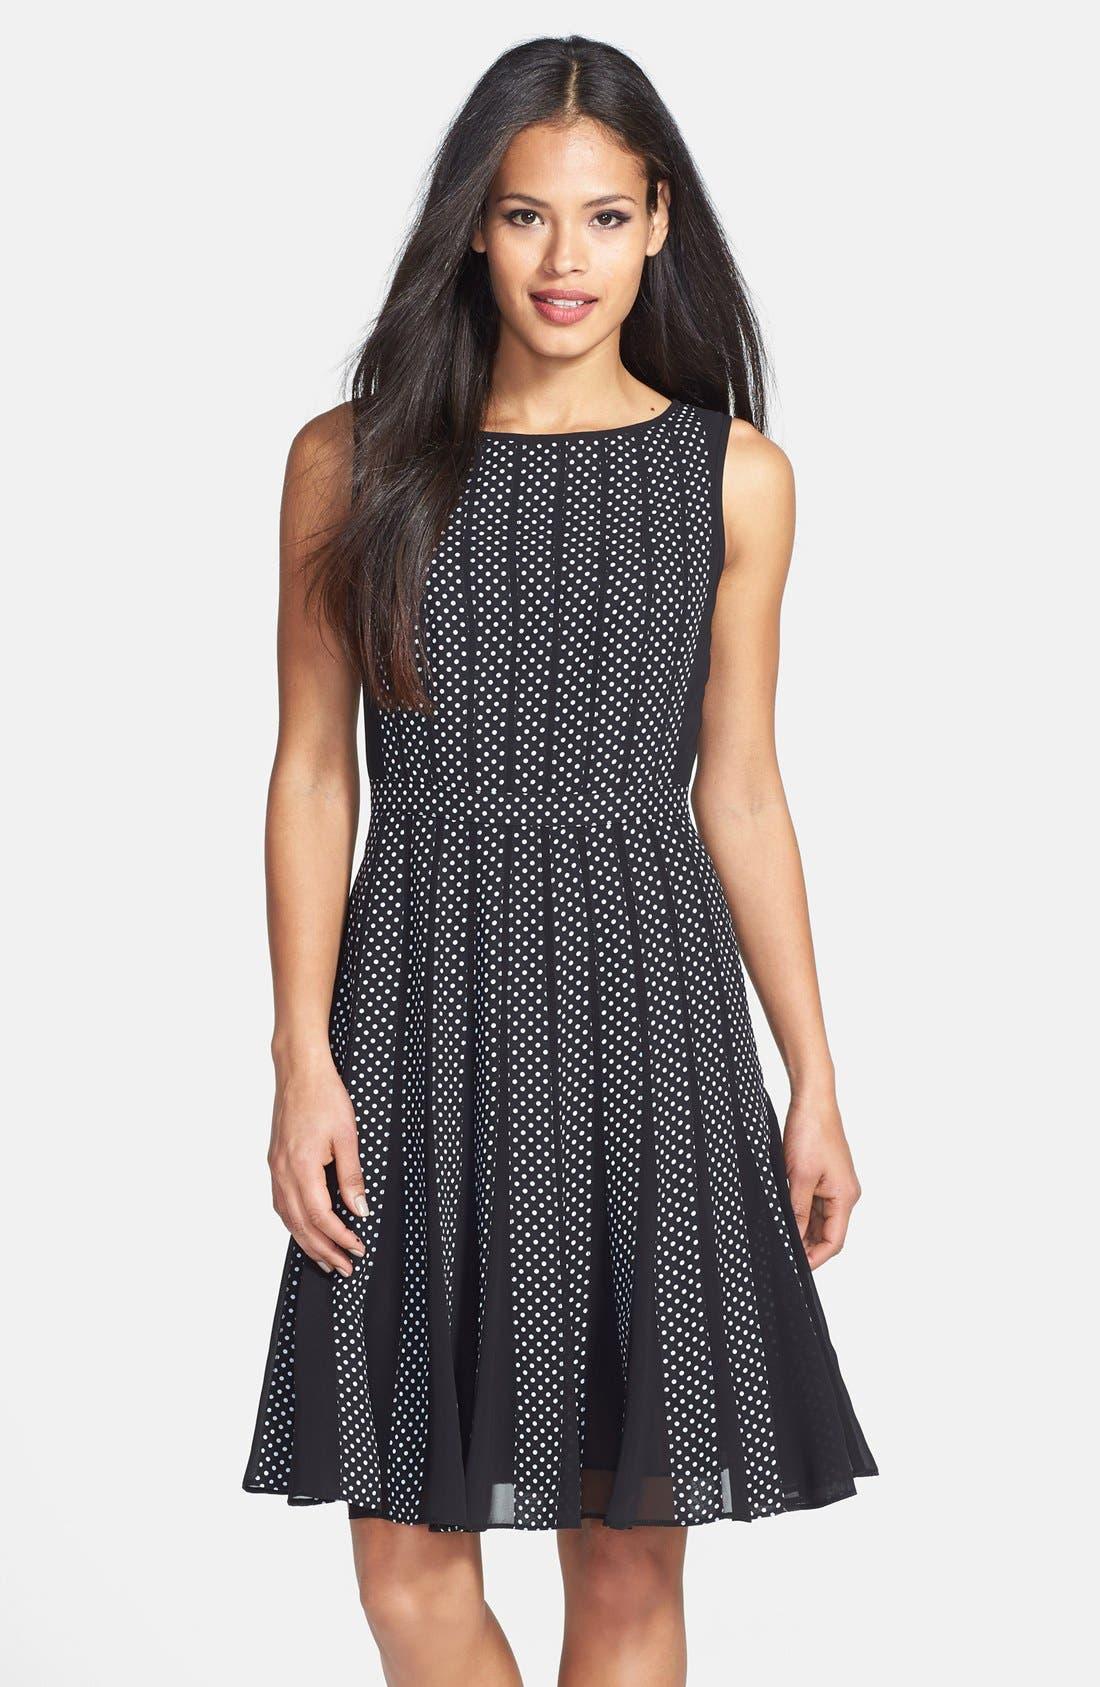 Main Image - Adrianna Papell Polka Dot Chiffon Fit & Flare Dress